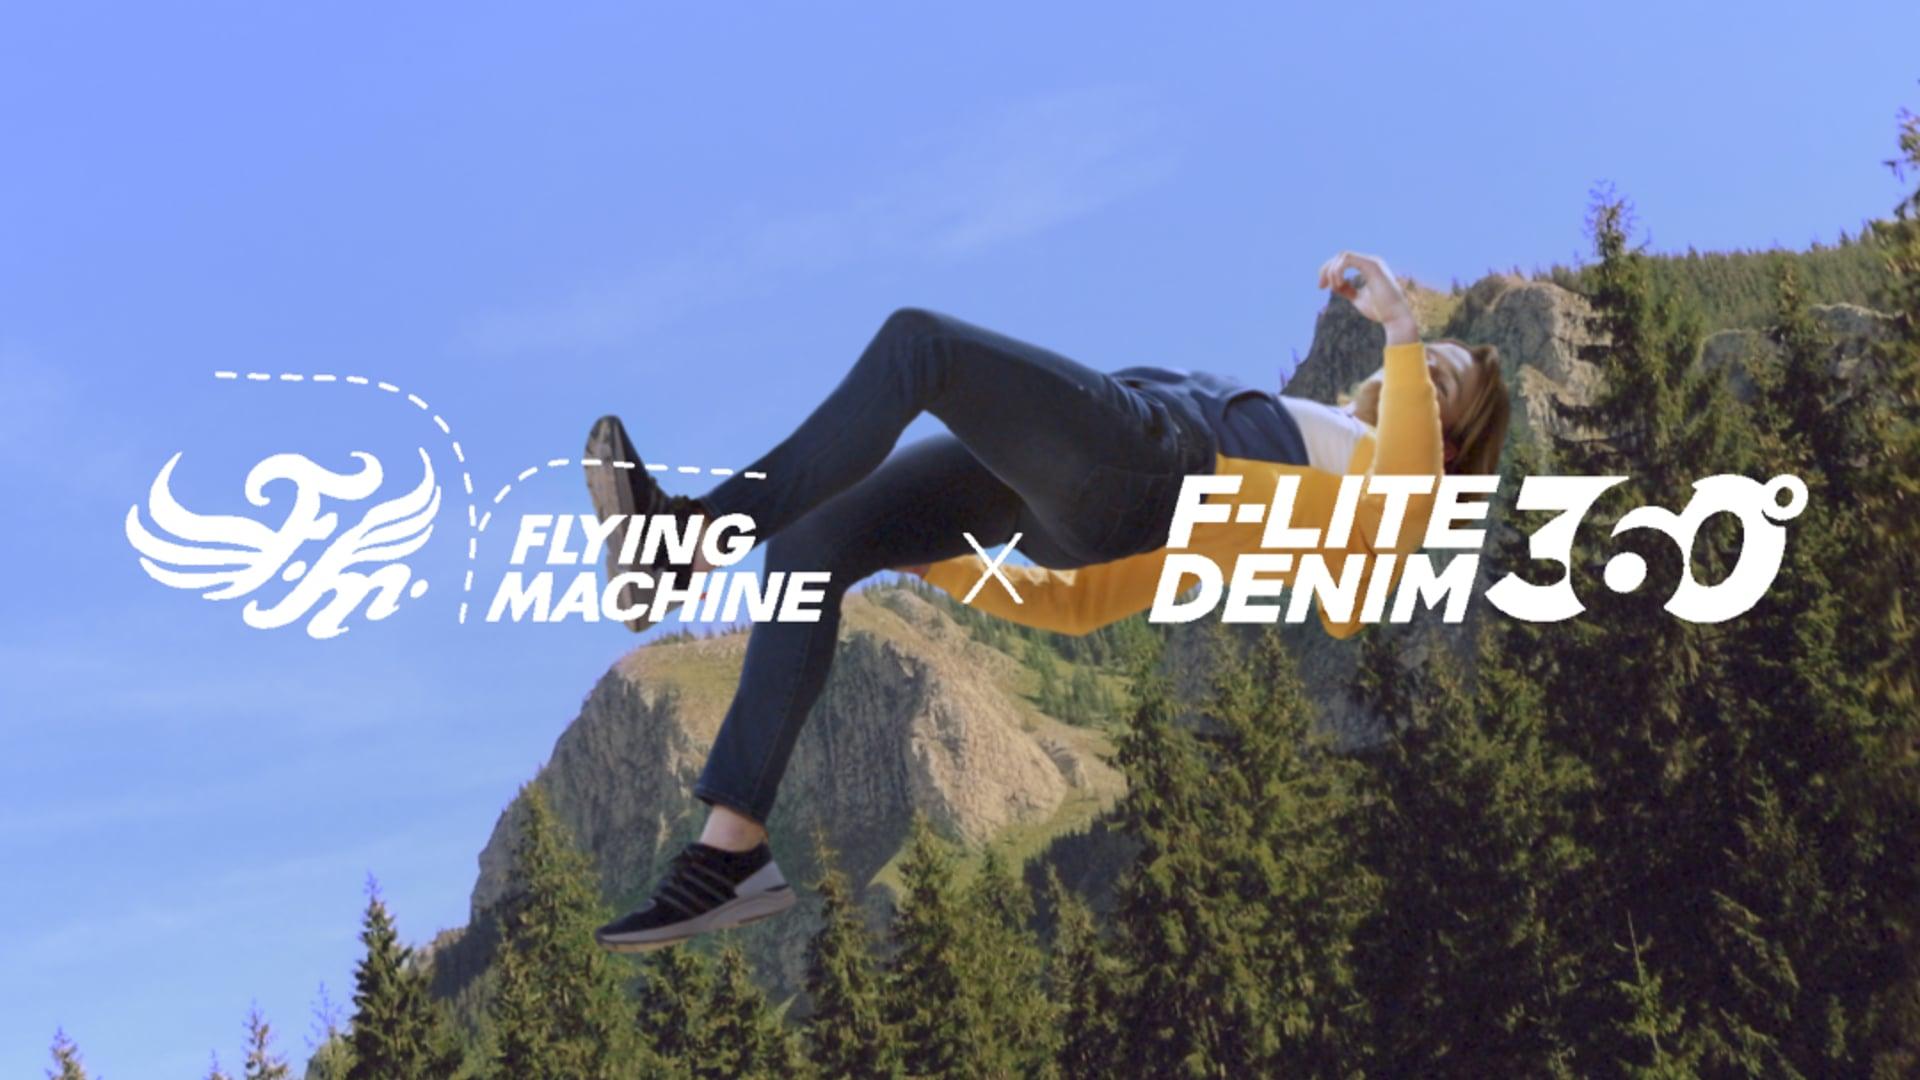 FLYING MACHINE - BREATHABLE DENIM